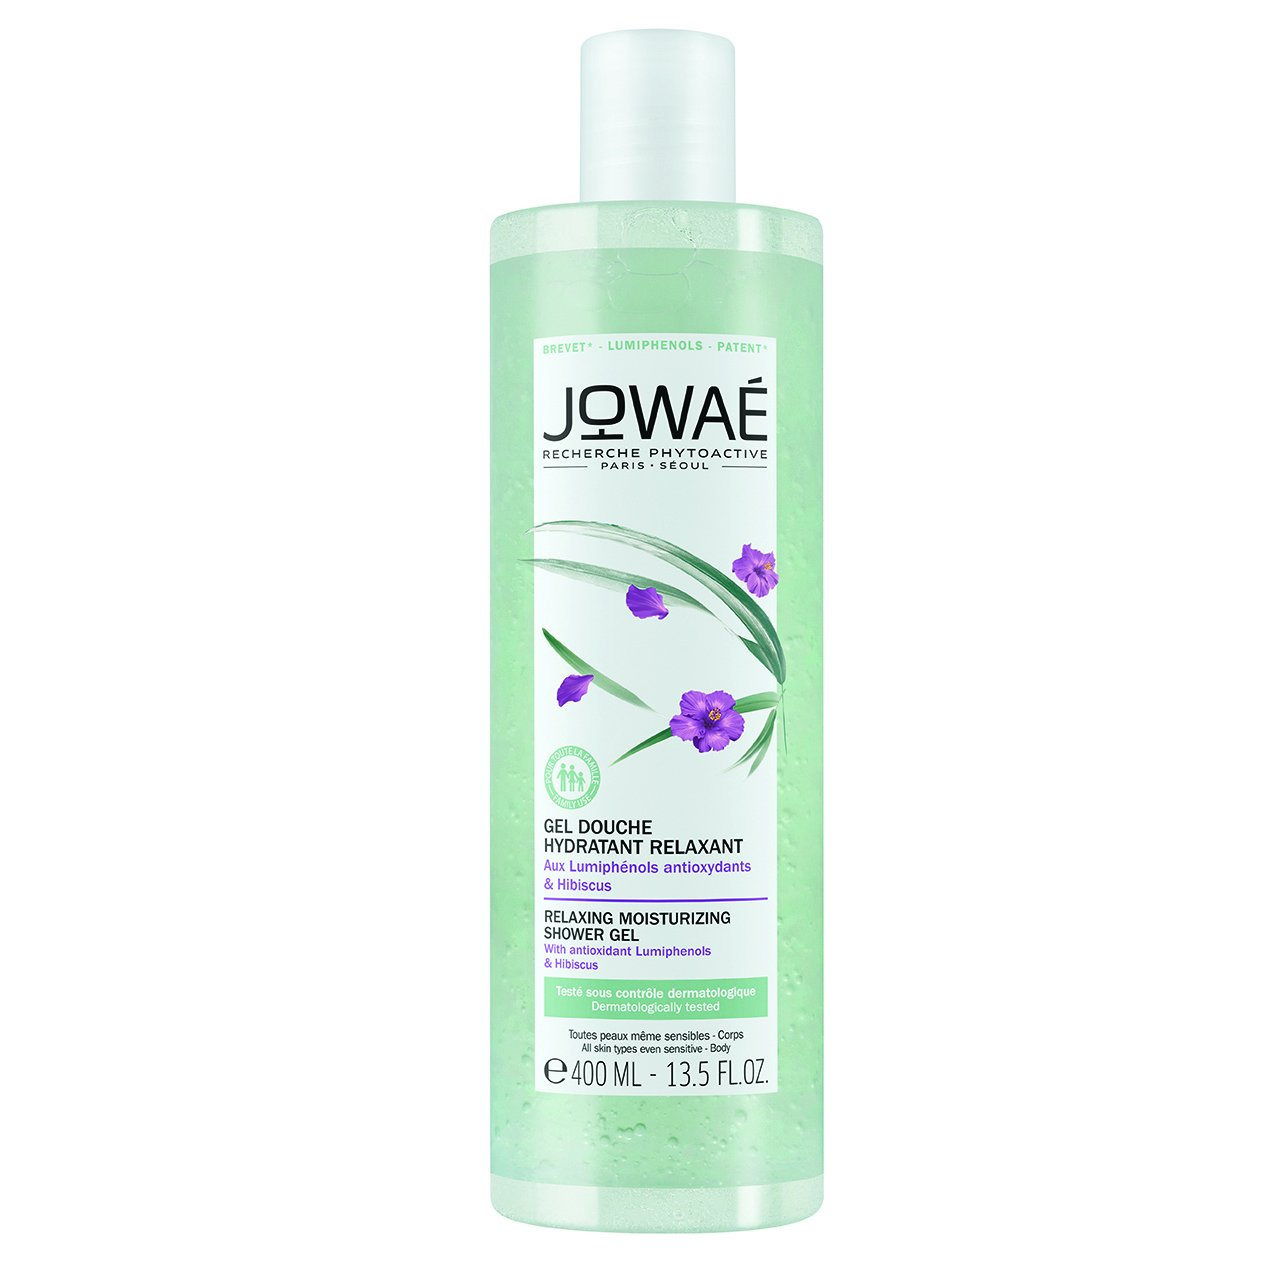 Jowae Relaxing Moisturizing Shower Gel Χαλαρωτικό Ενυδατικό Αφρόλουτρο με Αντιοξειδωτικές Φωτοφαινόλες & Ιβίσκο 400ml